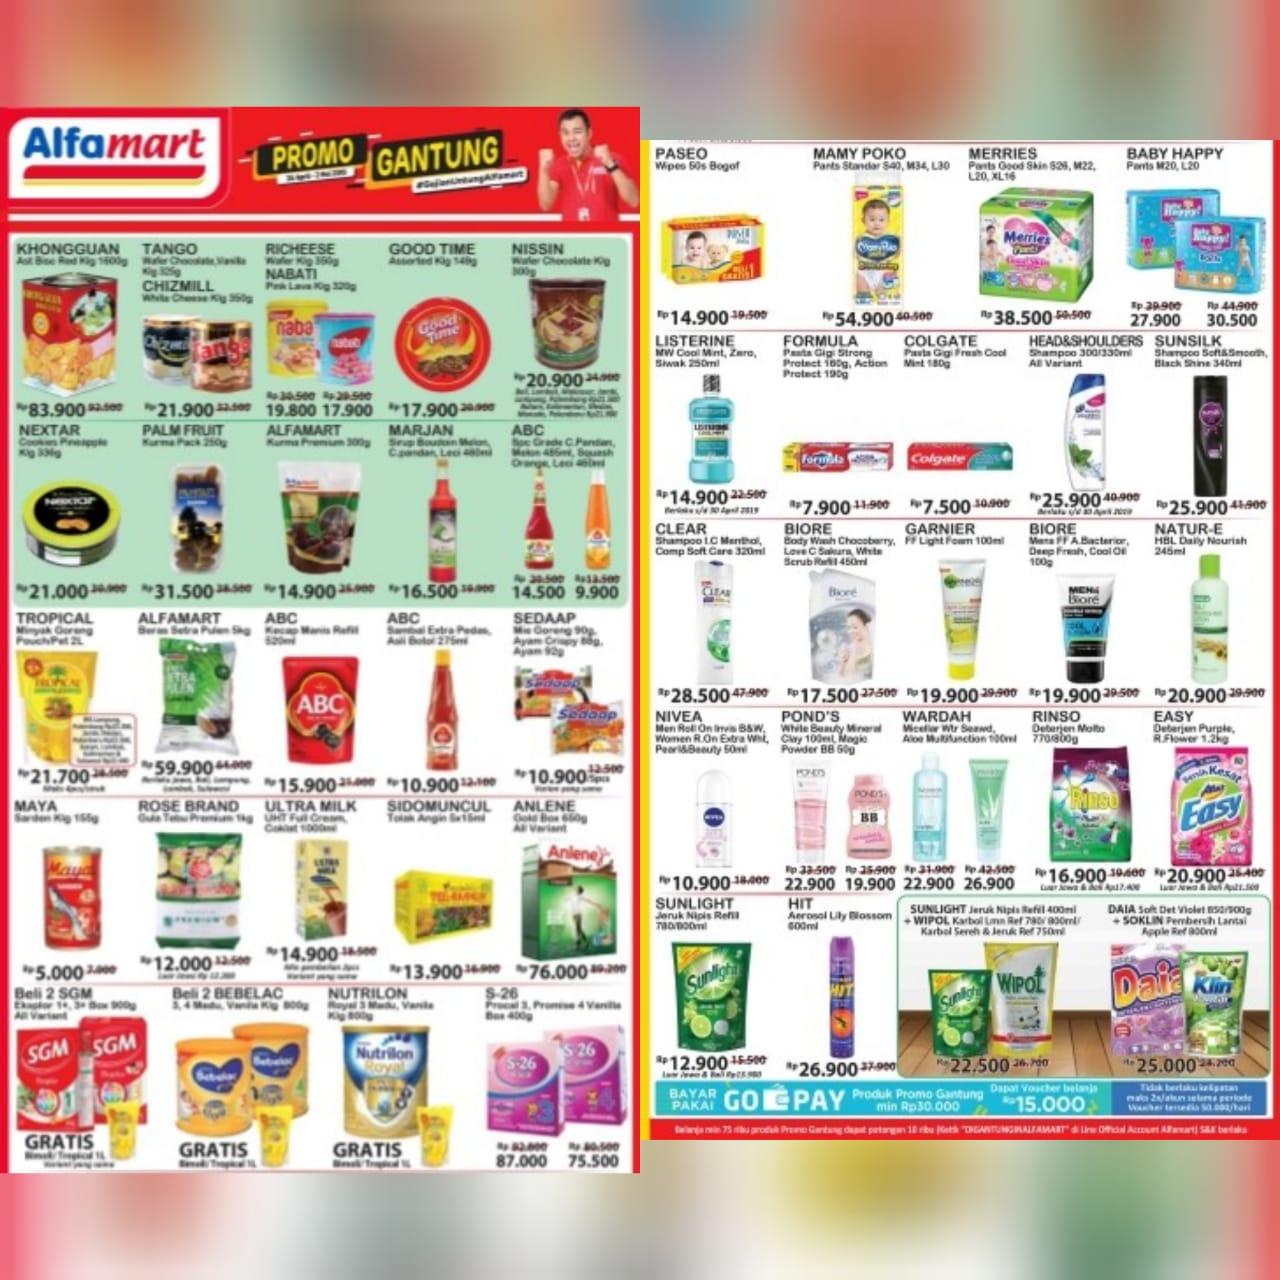 Katalog Promo JSM Alfamart Periode 24 April - 2 Mei 2019